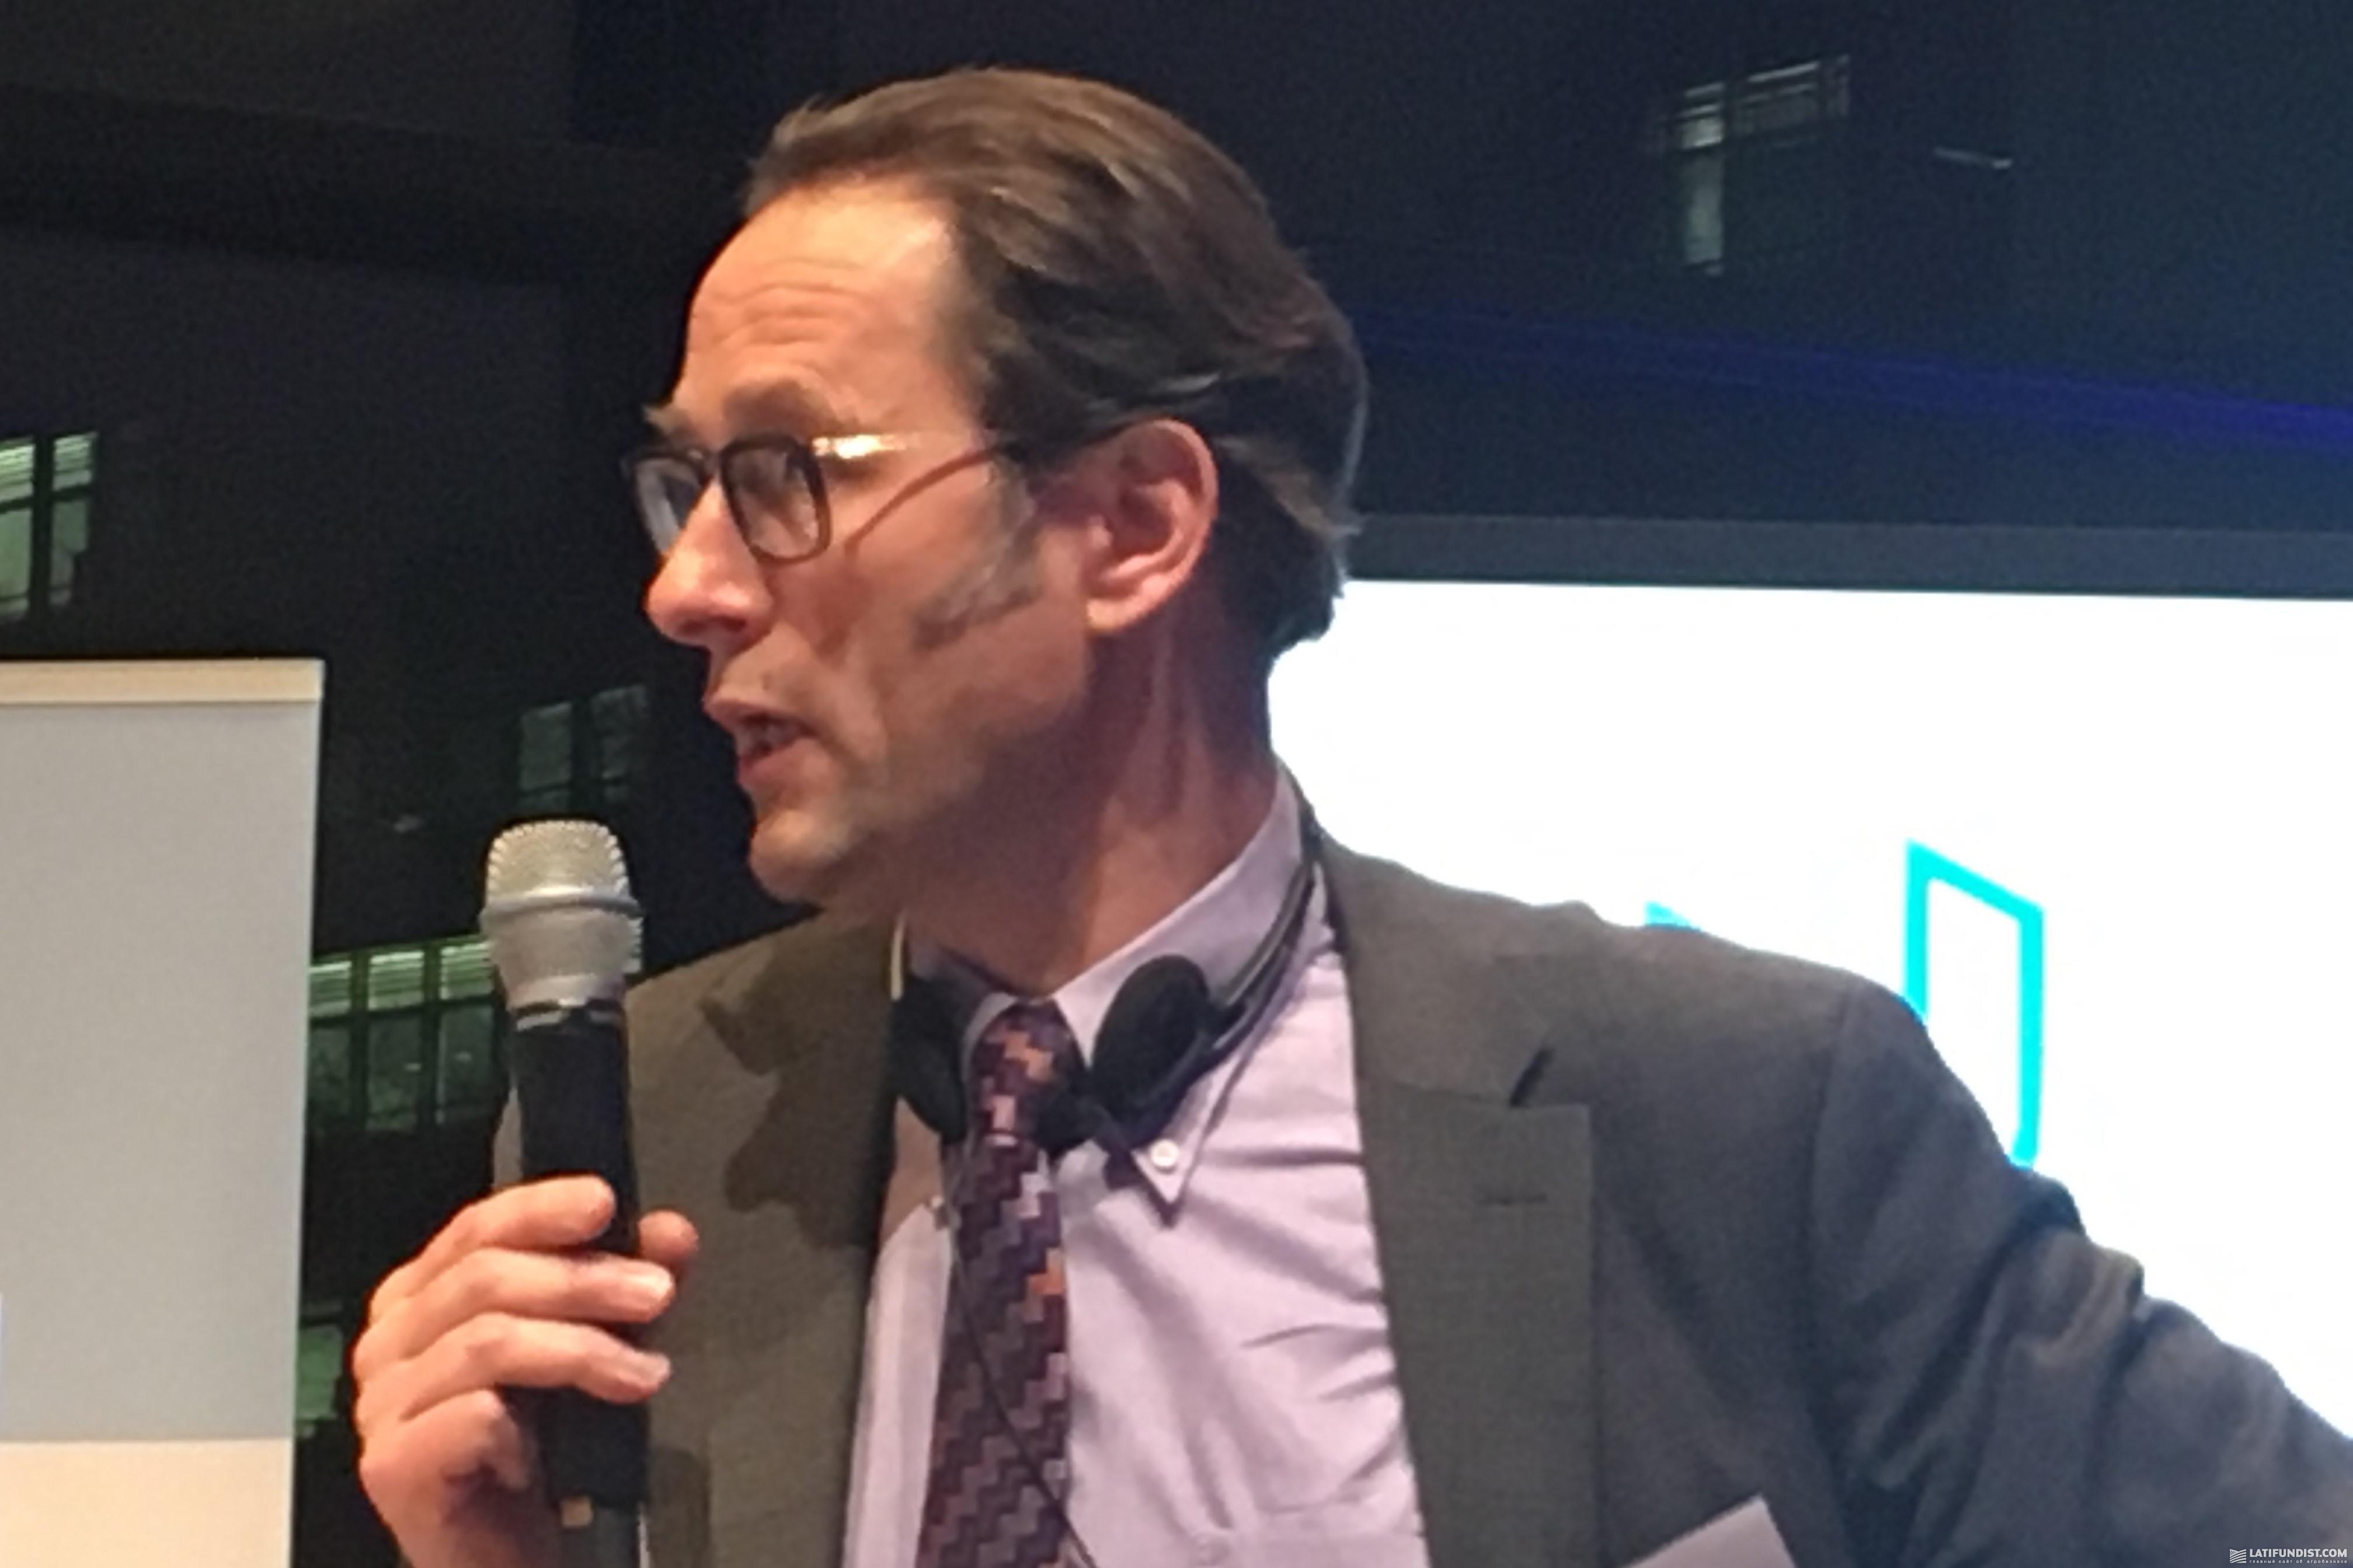 Томас Оттер, главный управляющий Landesbank Baden-Württemberg